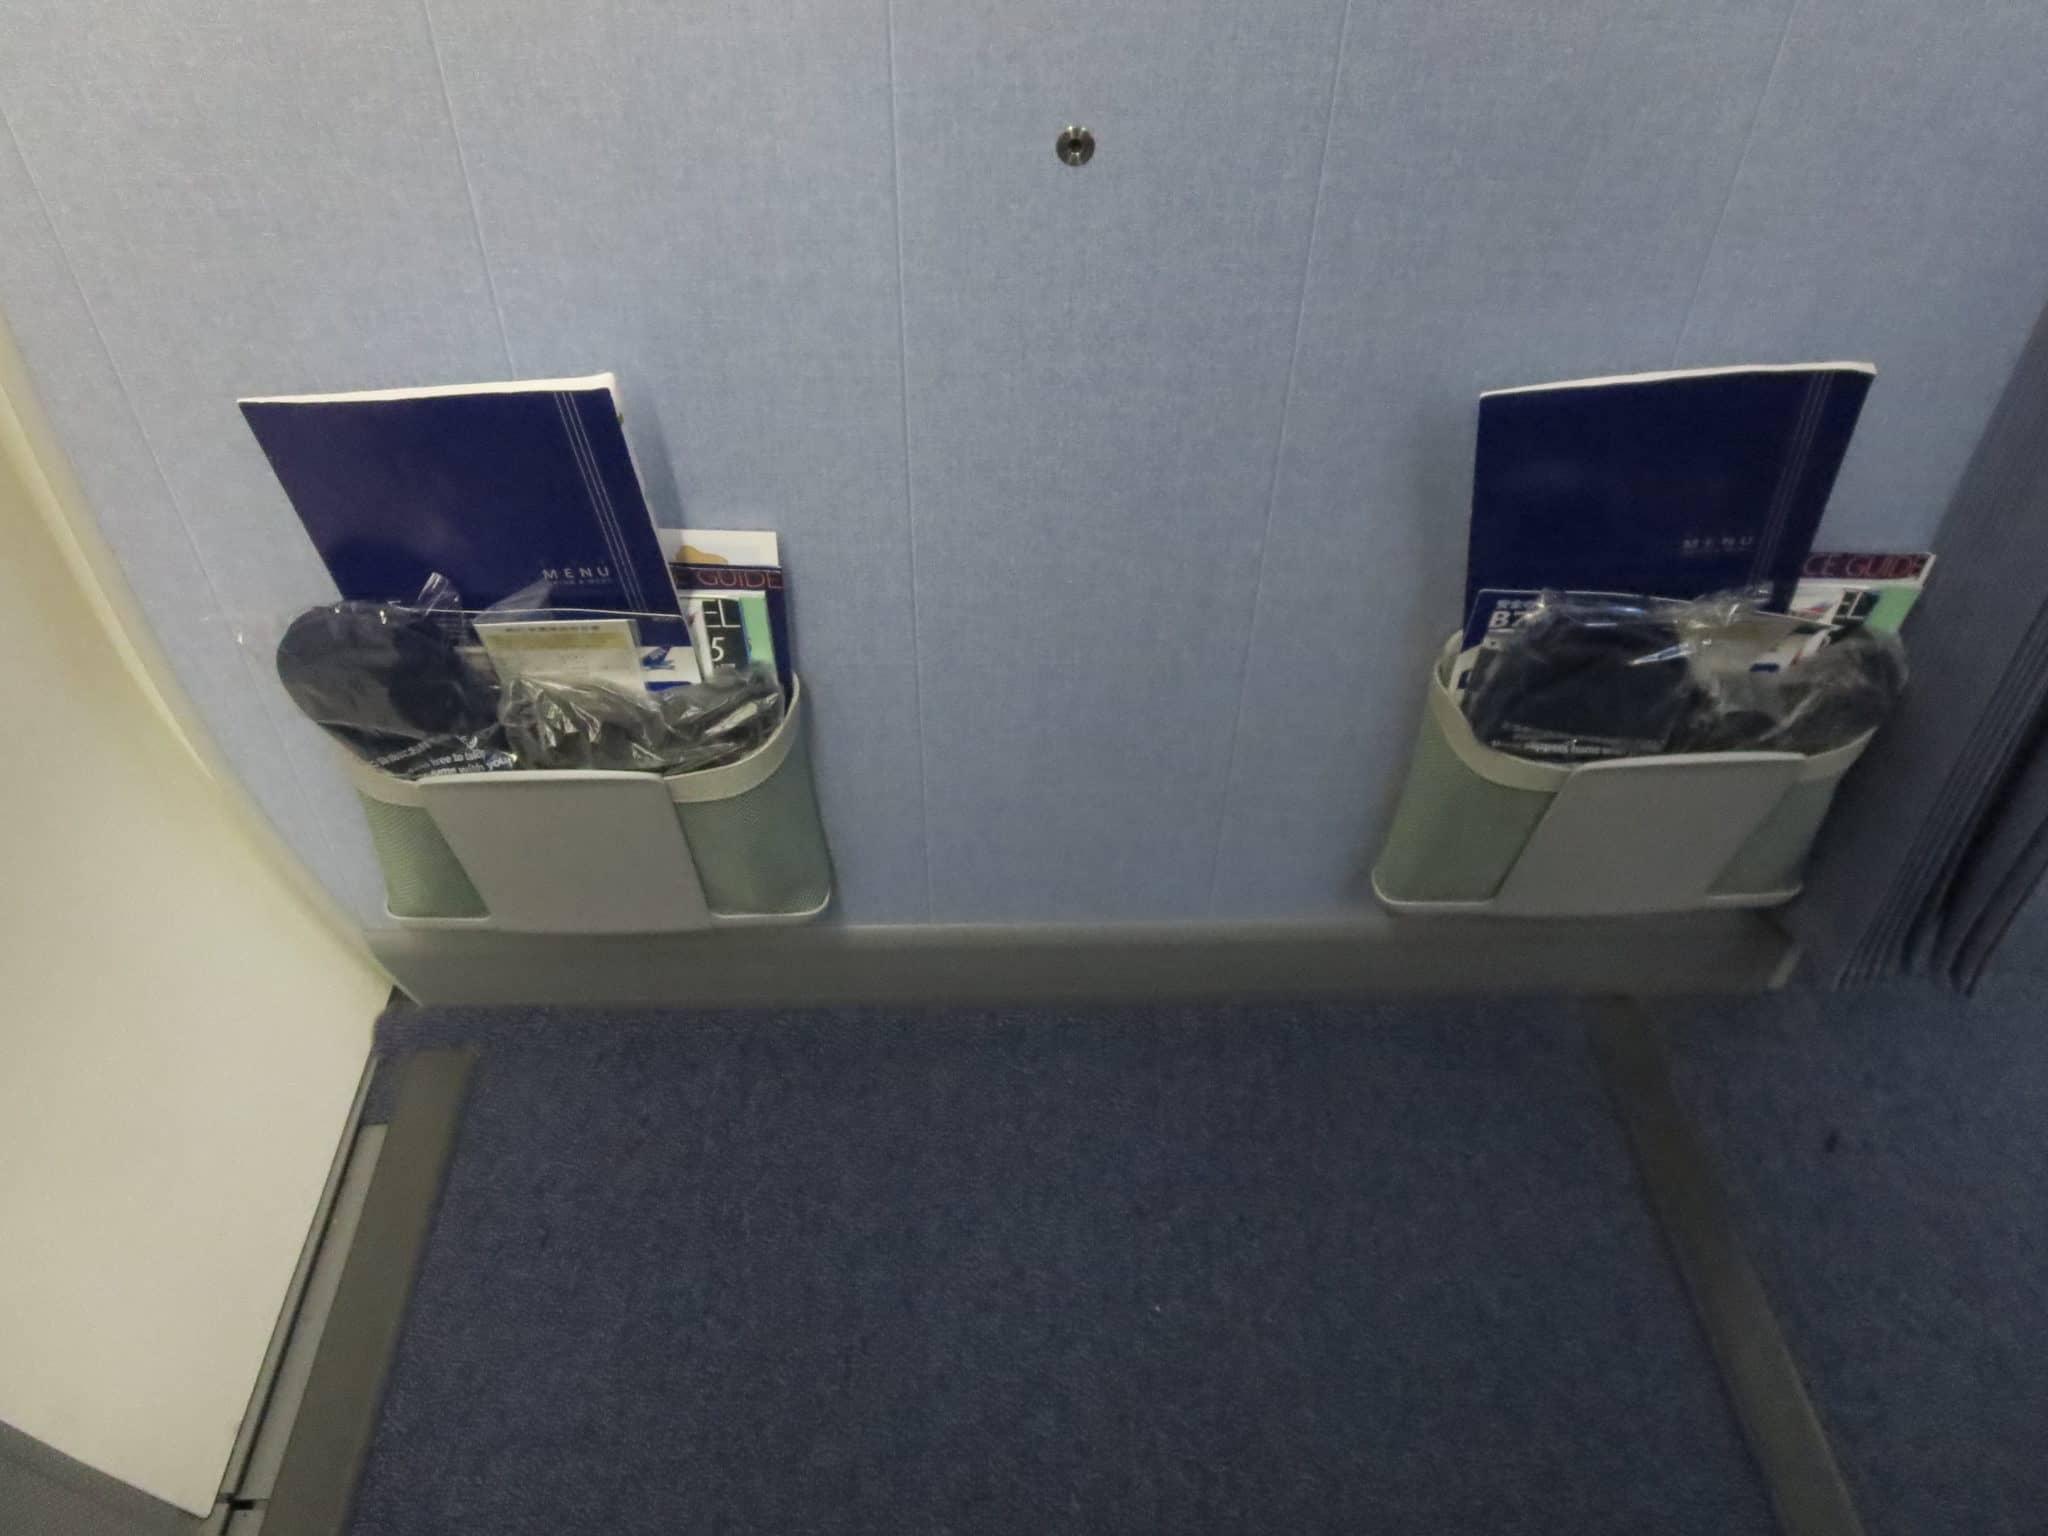 ANA Business Class 787-8 Fußraum